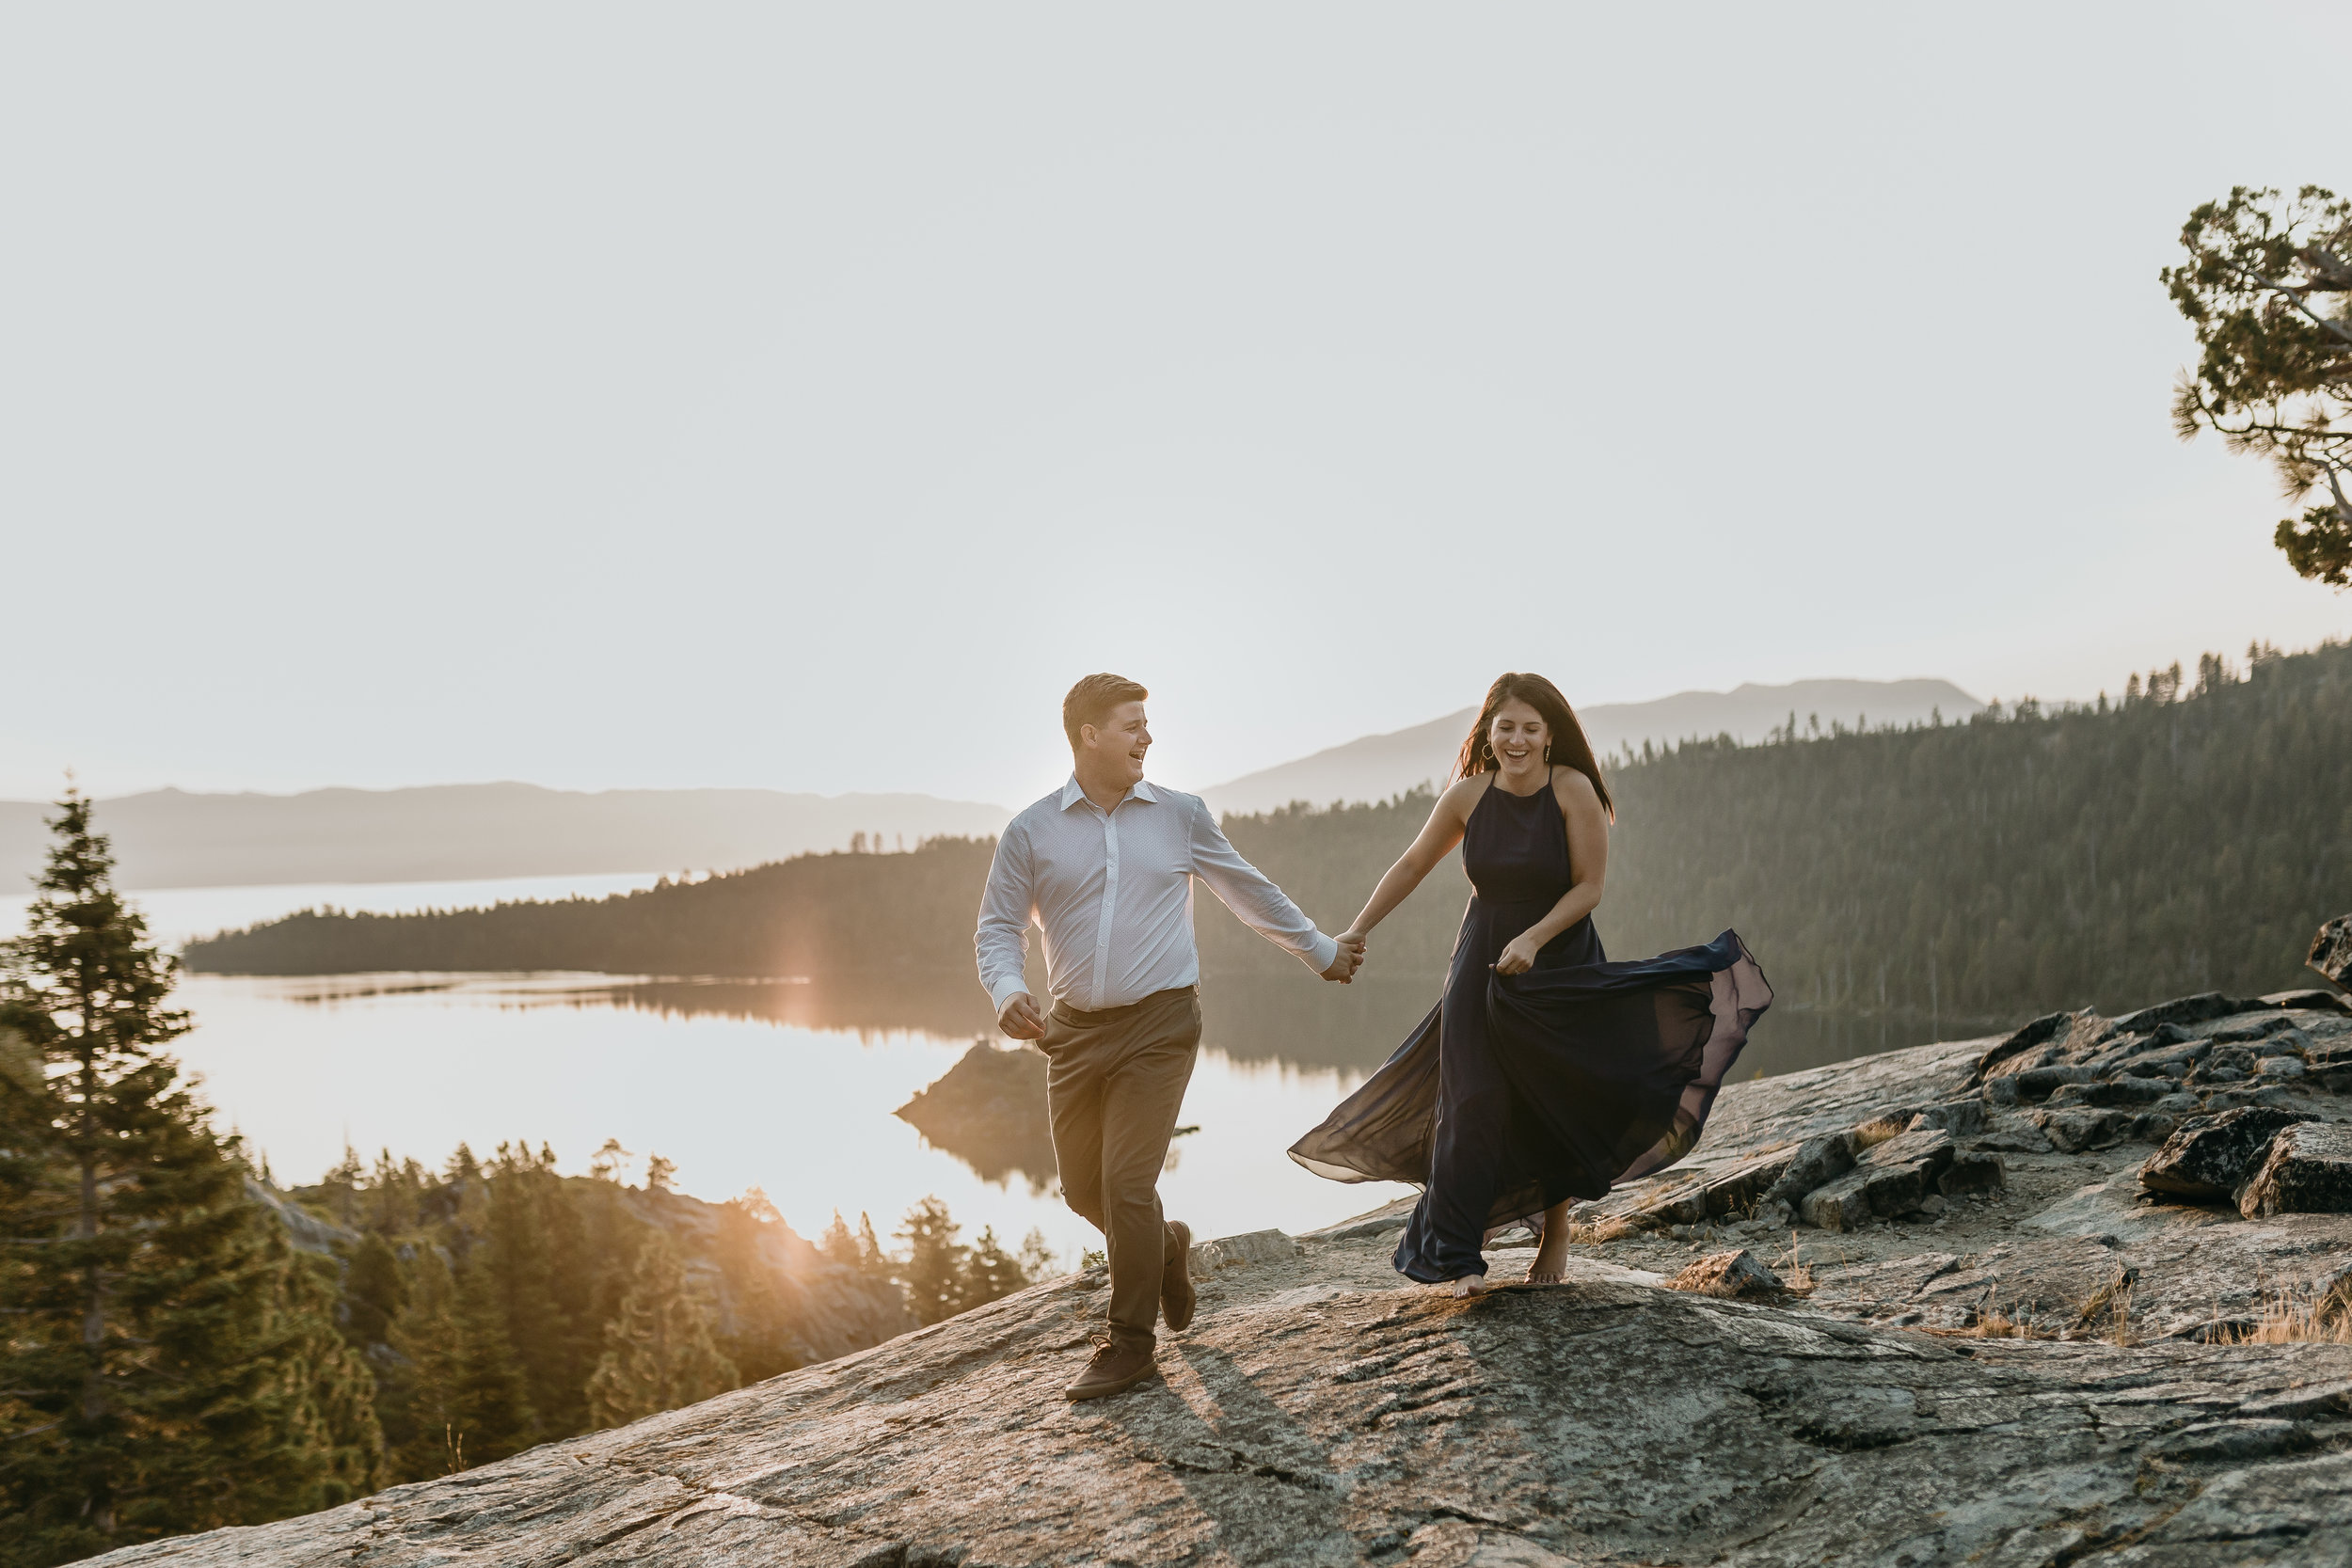 nicole-daacke-photography-lake-tahoe-sunrise-summer-adventure-engagement-photos-nevada-wedding-elopement-photographer-golden-emerald-bay-light-pine-trees-summer-vibe-fun-carefree-authentic-love-24.jpg